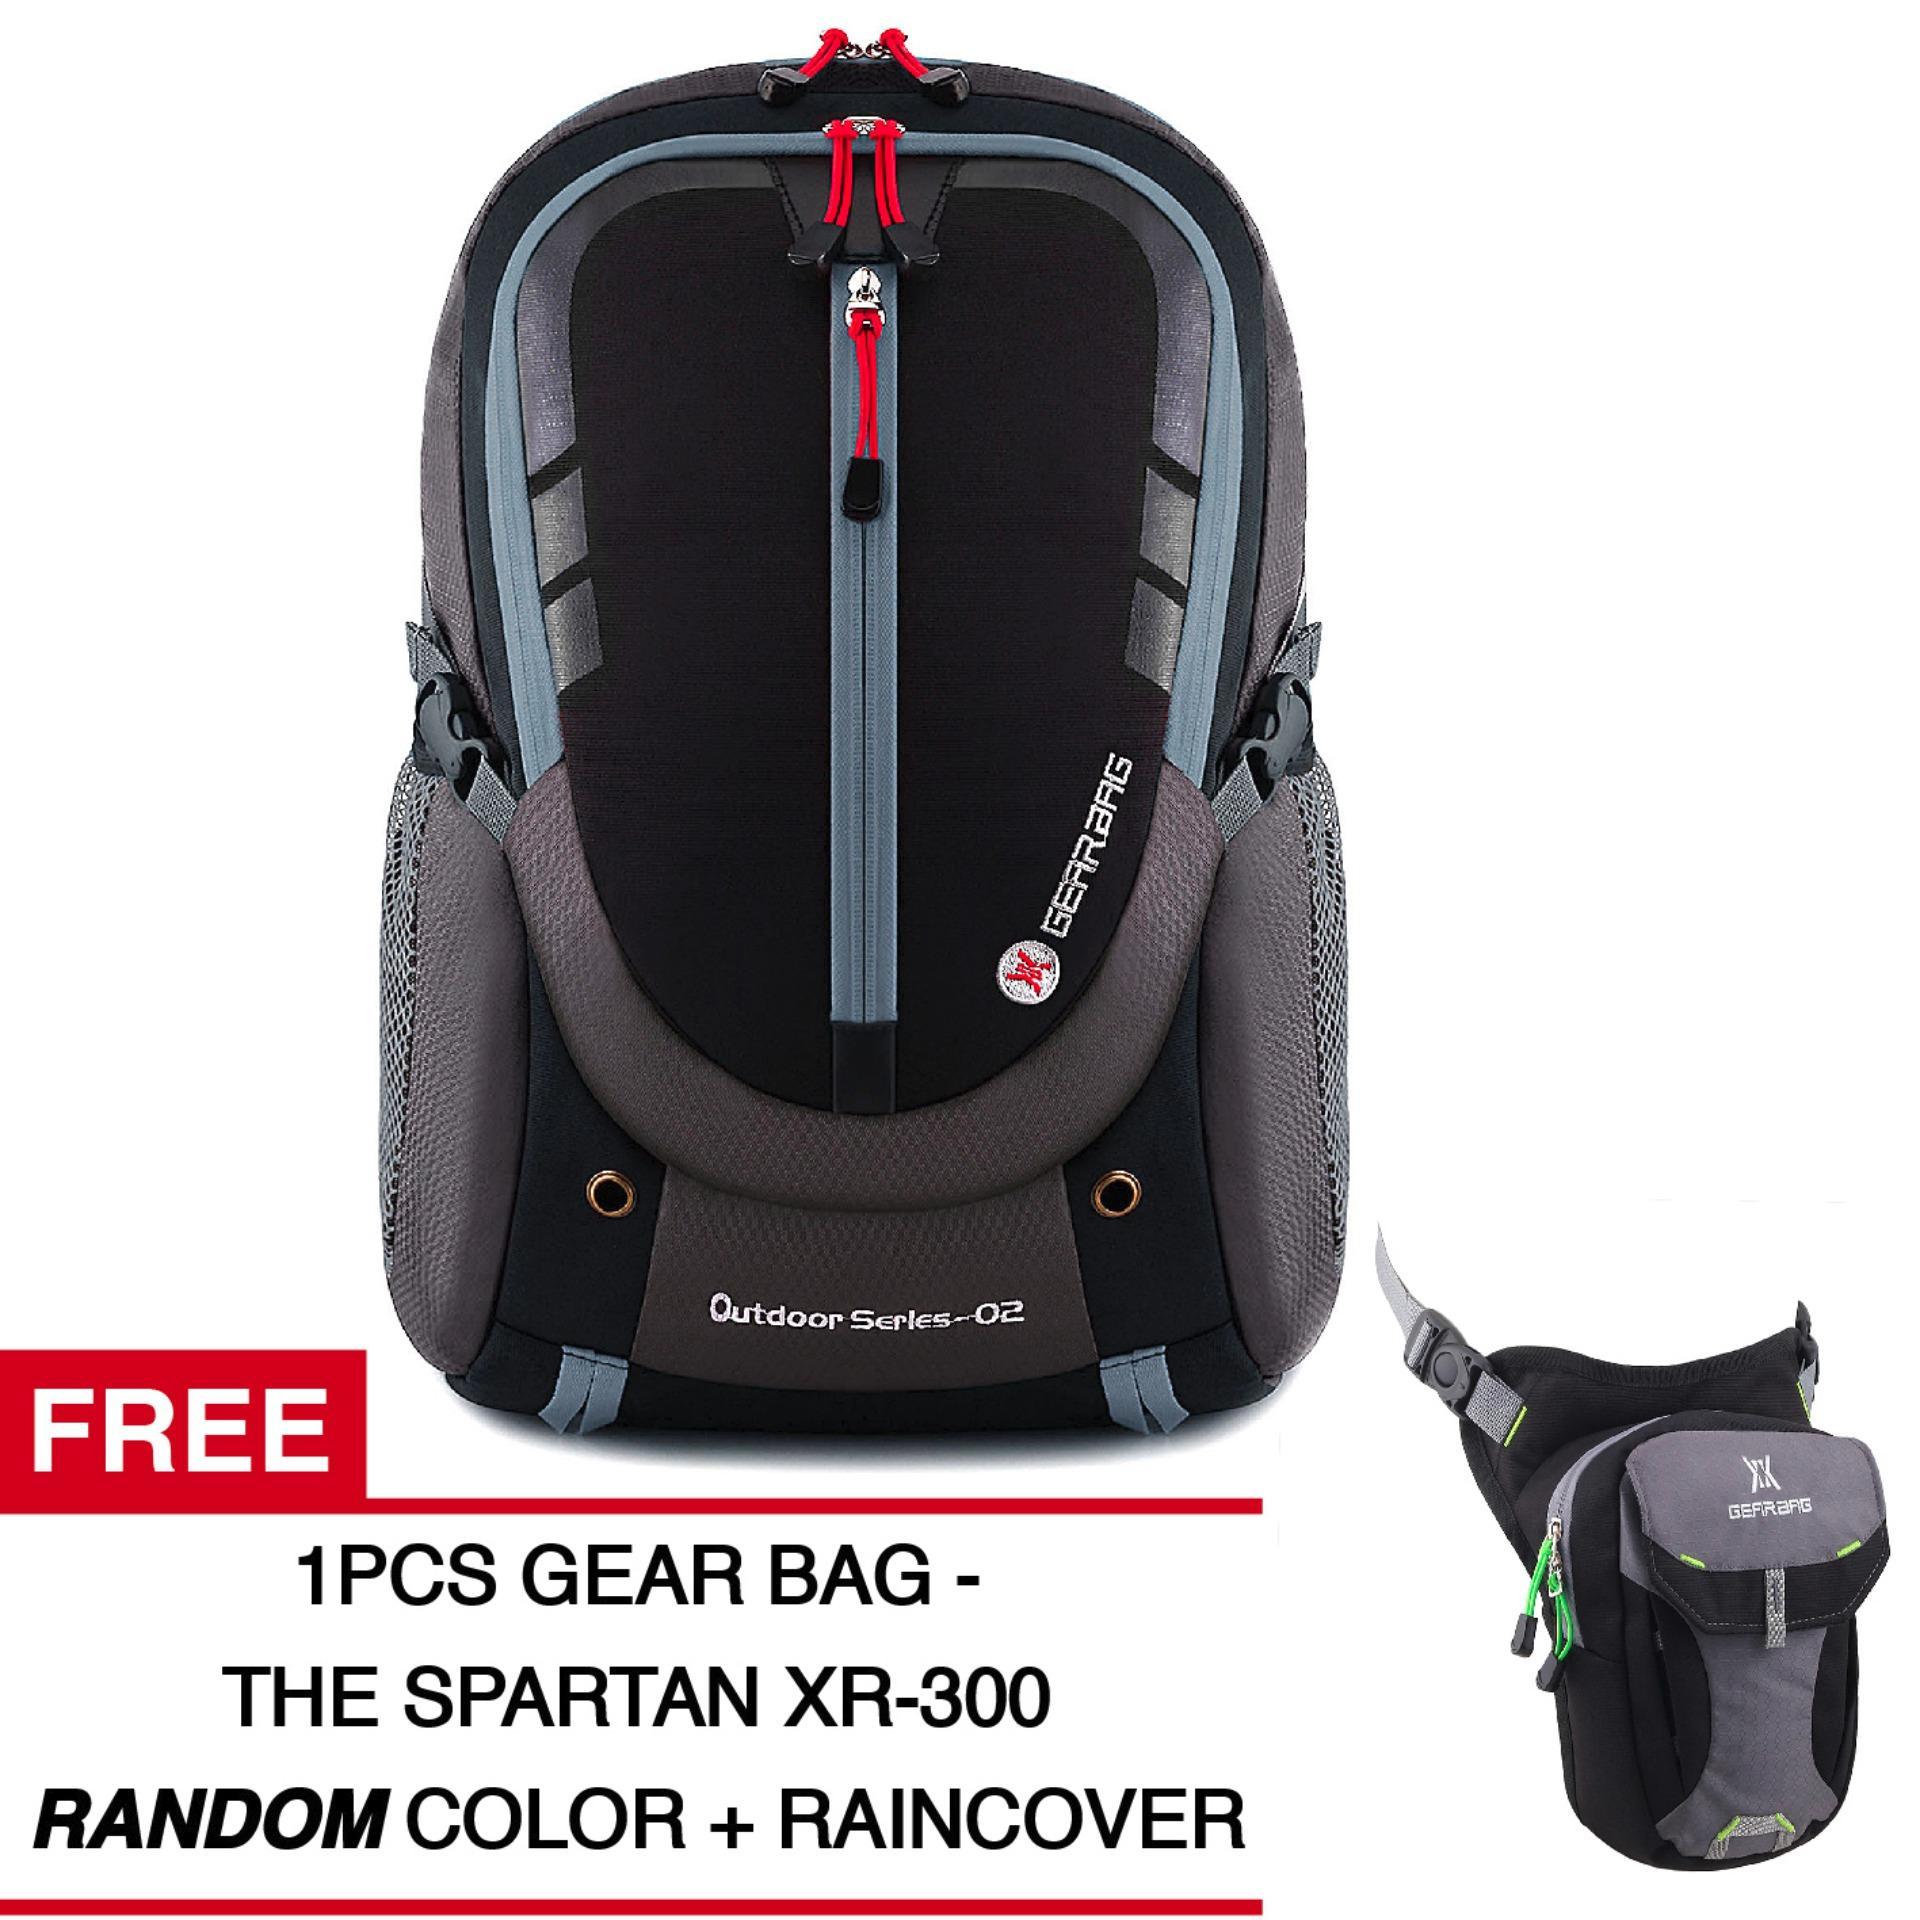 Tas Ransel Gear Bag - Rebellion K2-SO Tas Laptop Backpack - Black Grey +